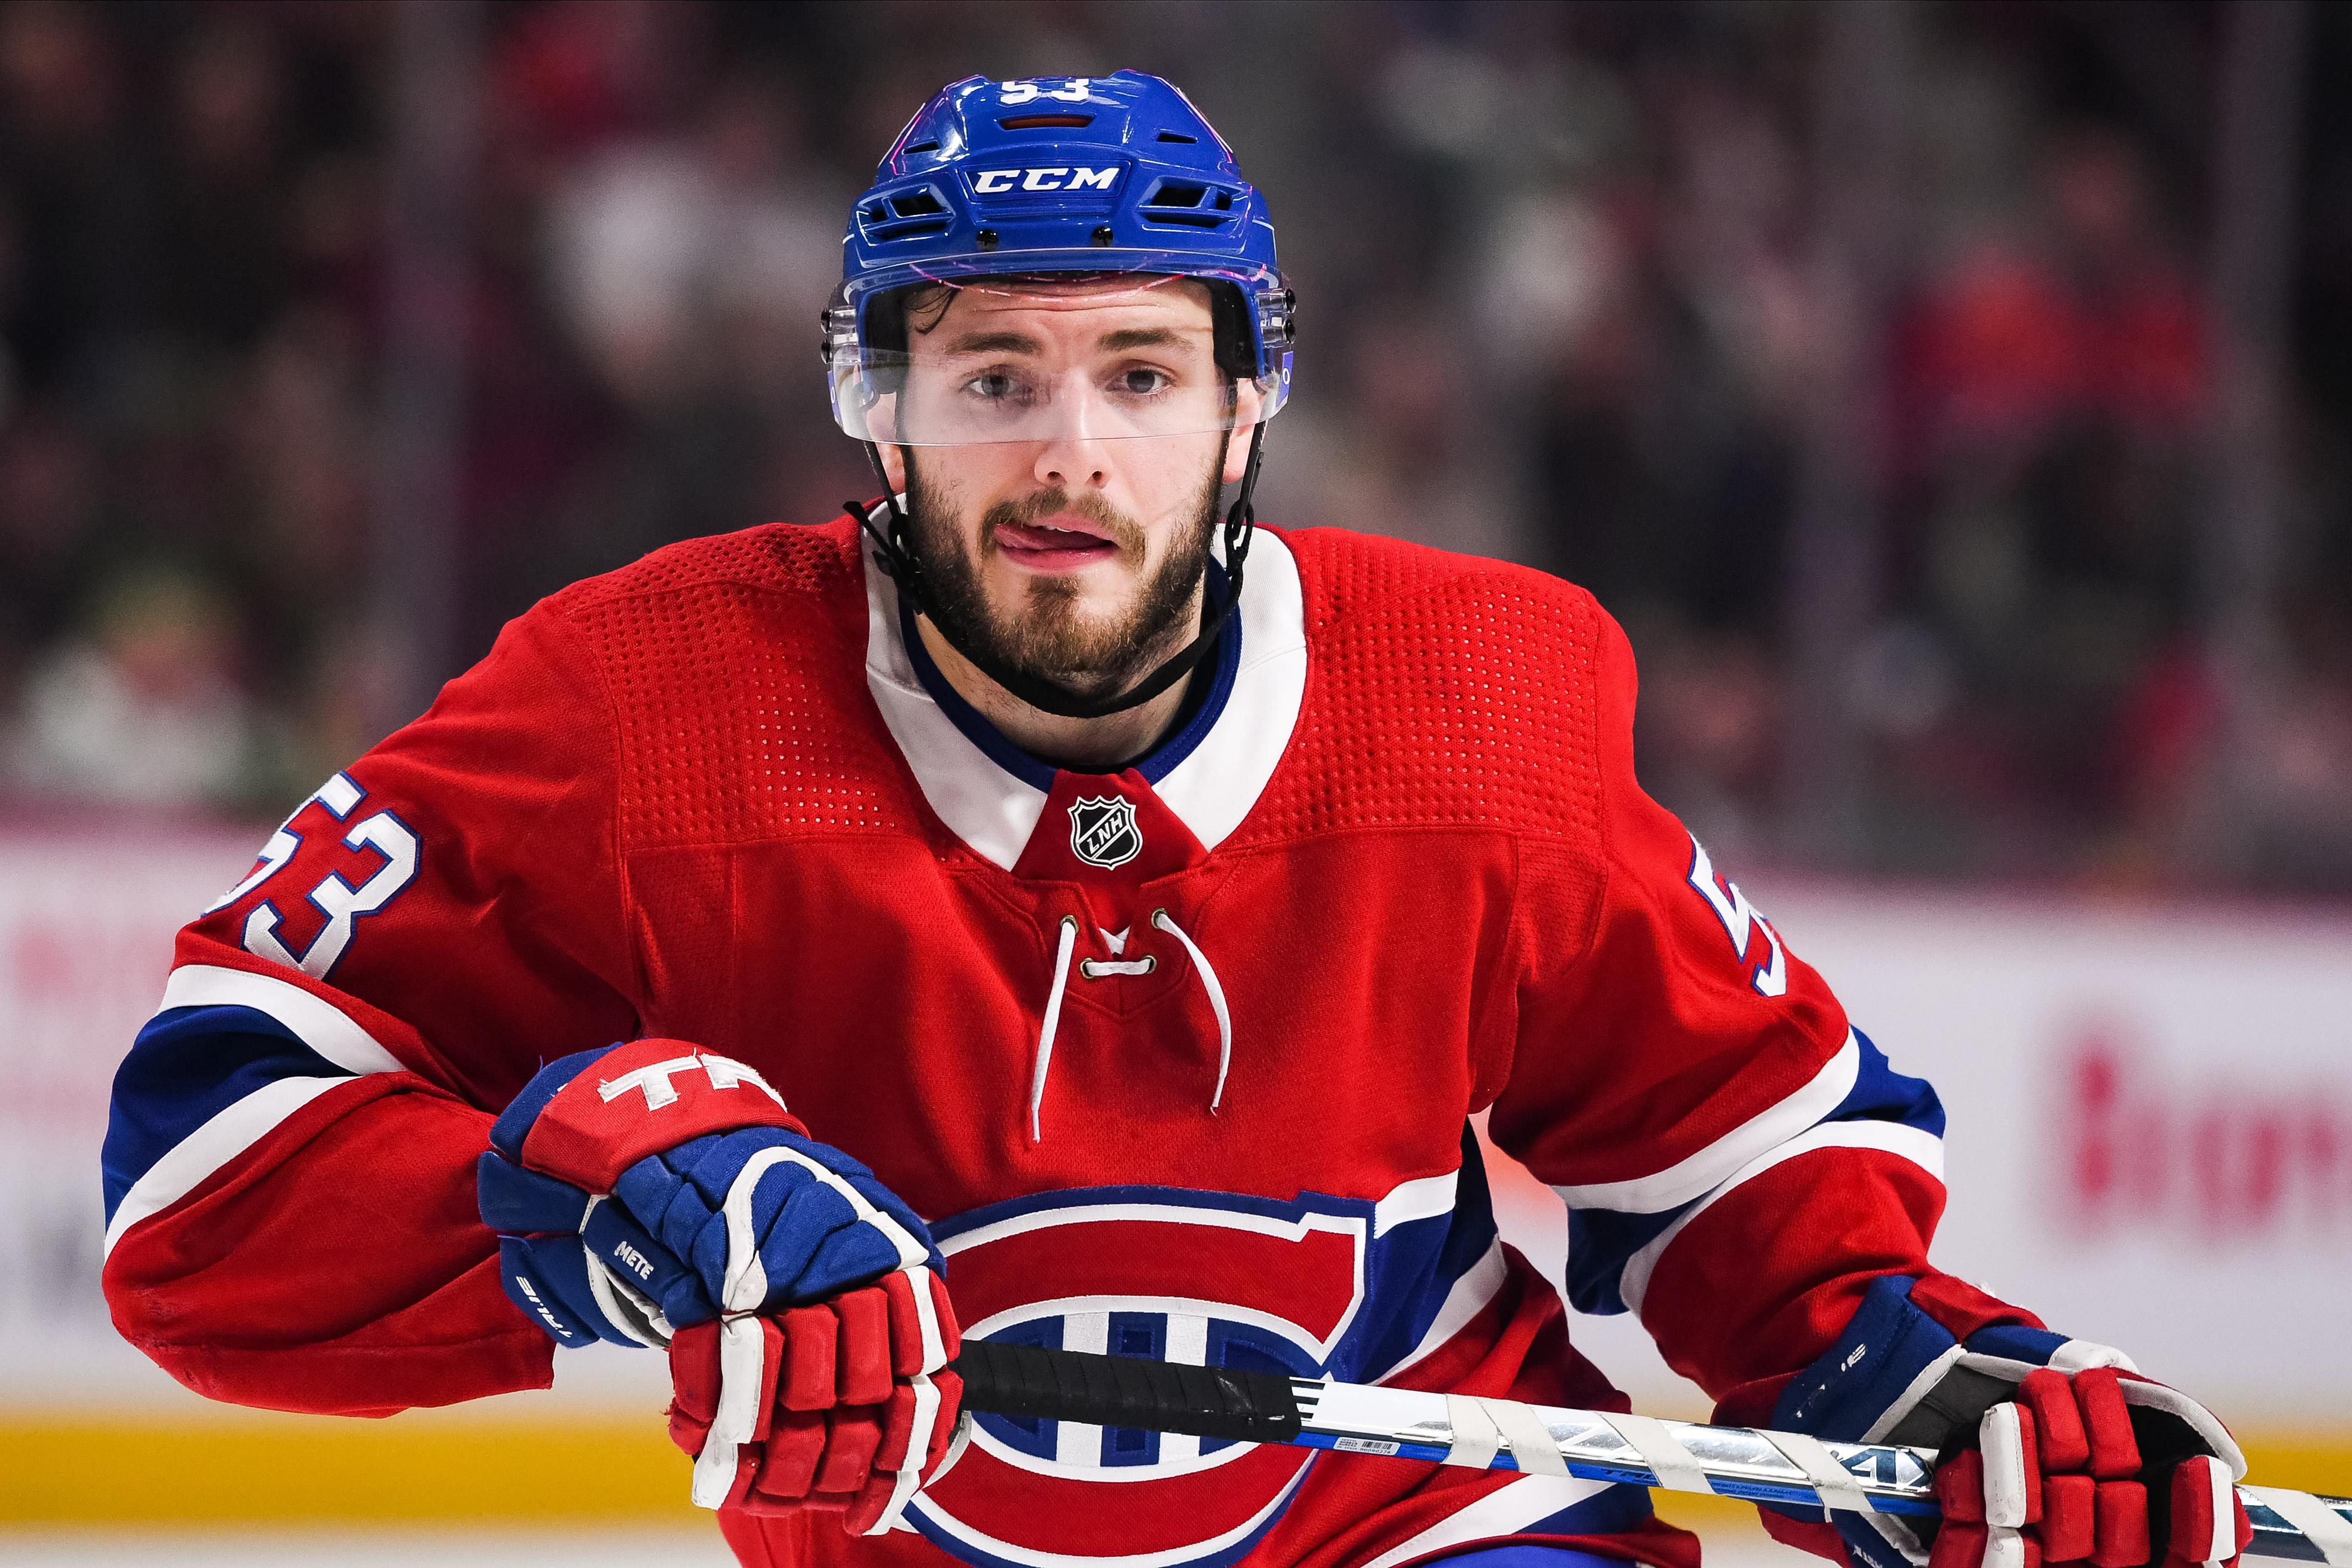 NHL: FEB 15 Stars at Canadiens